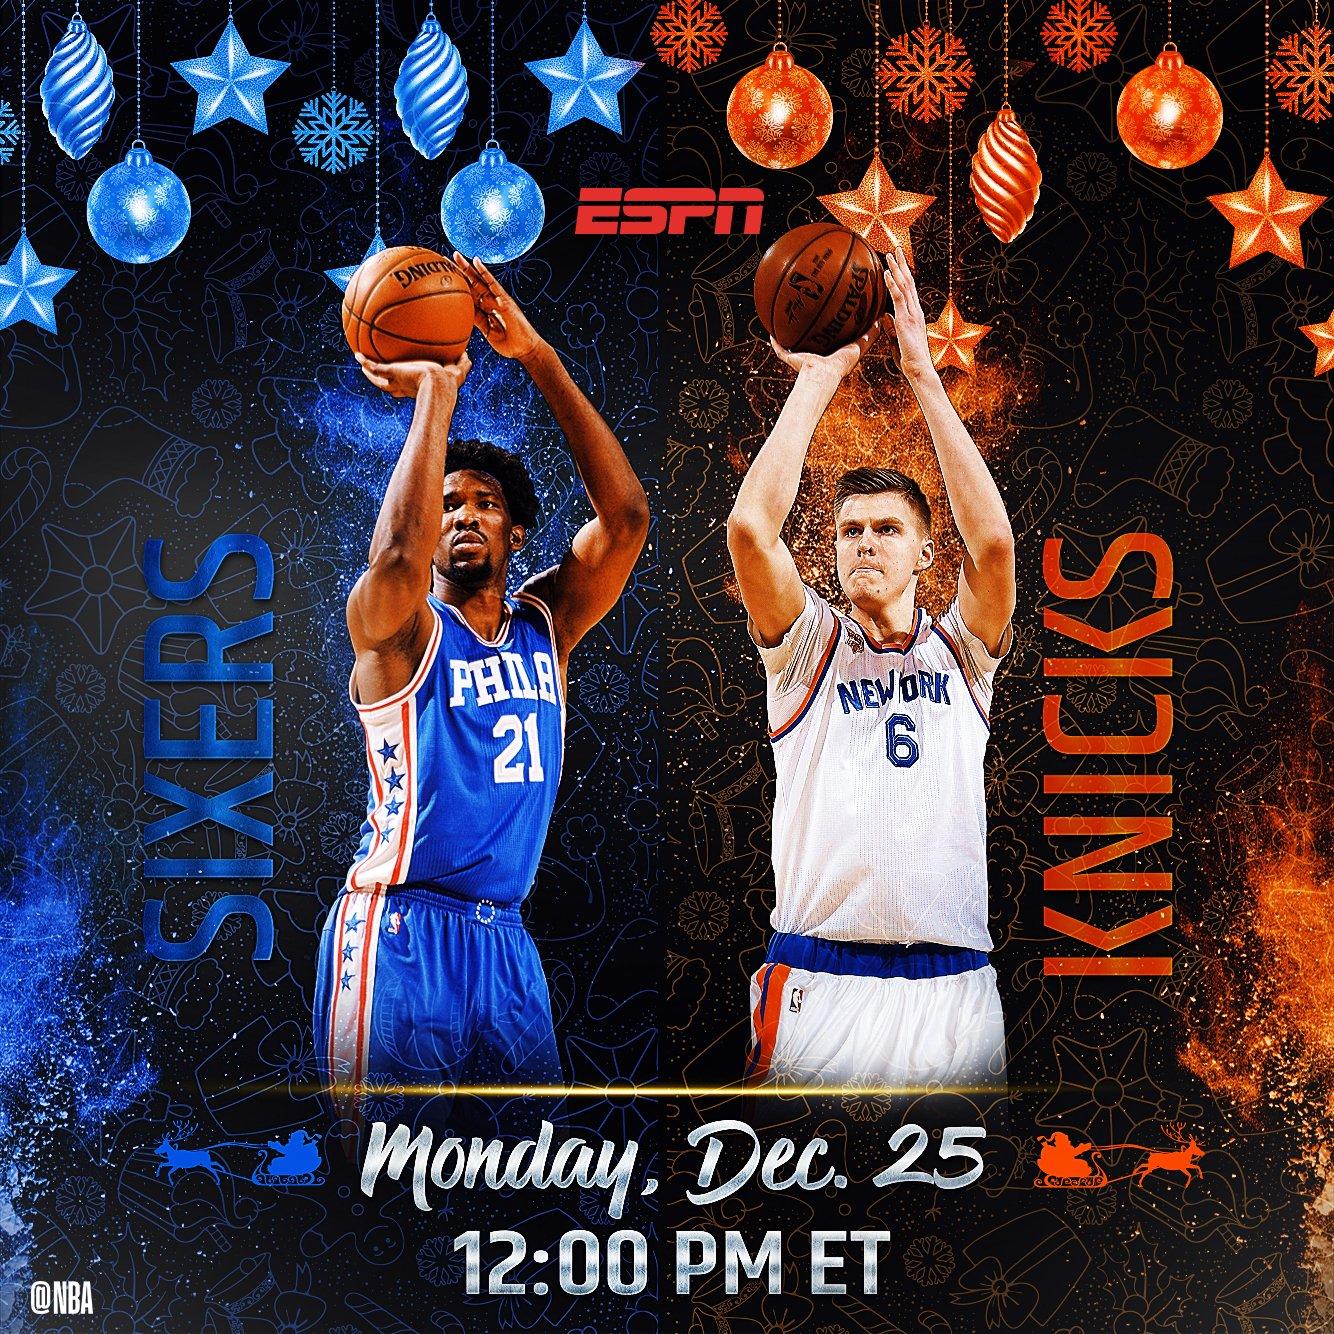 #NBAXmas 2017 ����!  12pm/et on ESPN: @sixers visit @nyknicks https://t.co/gz90zzLXbp